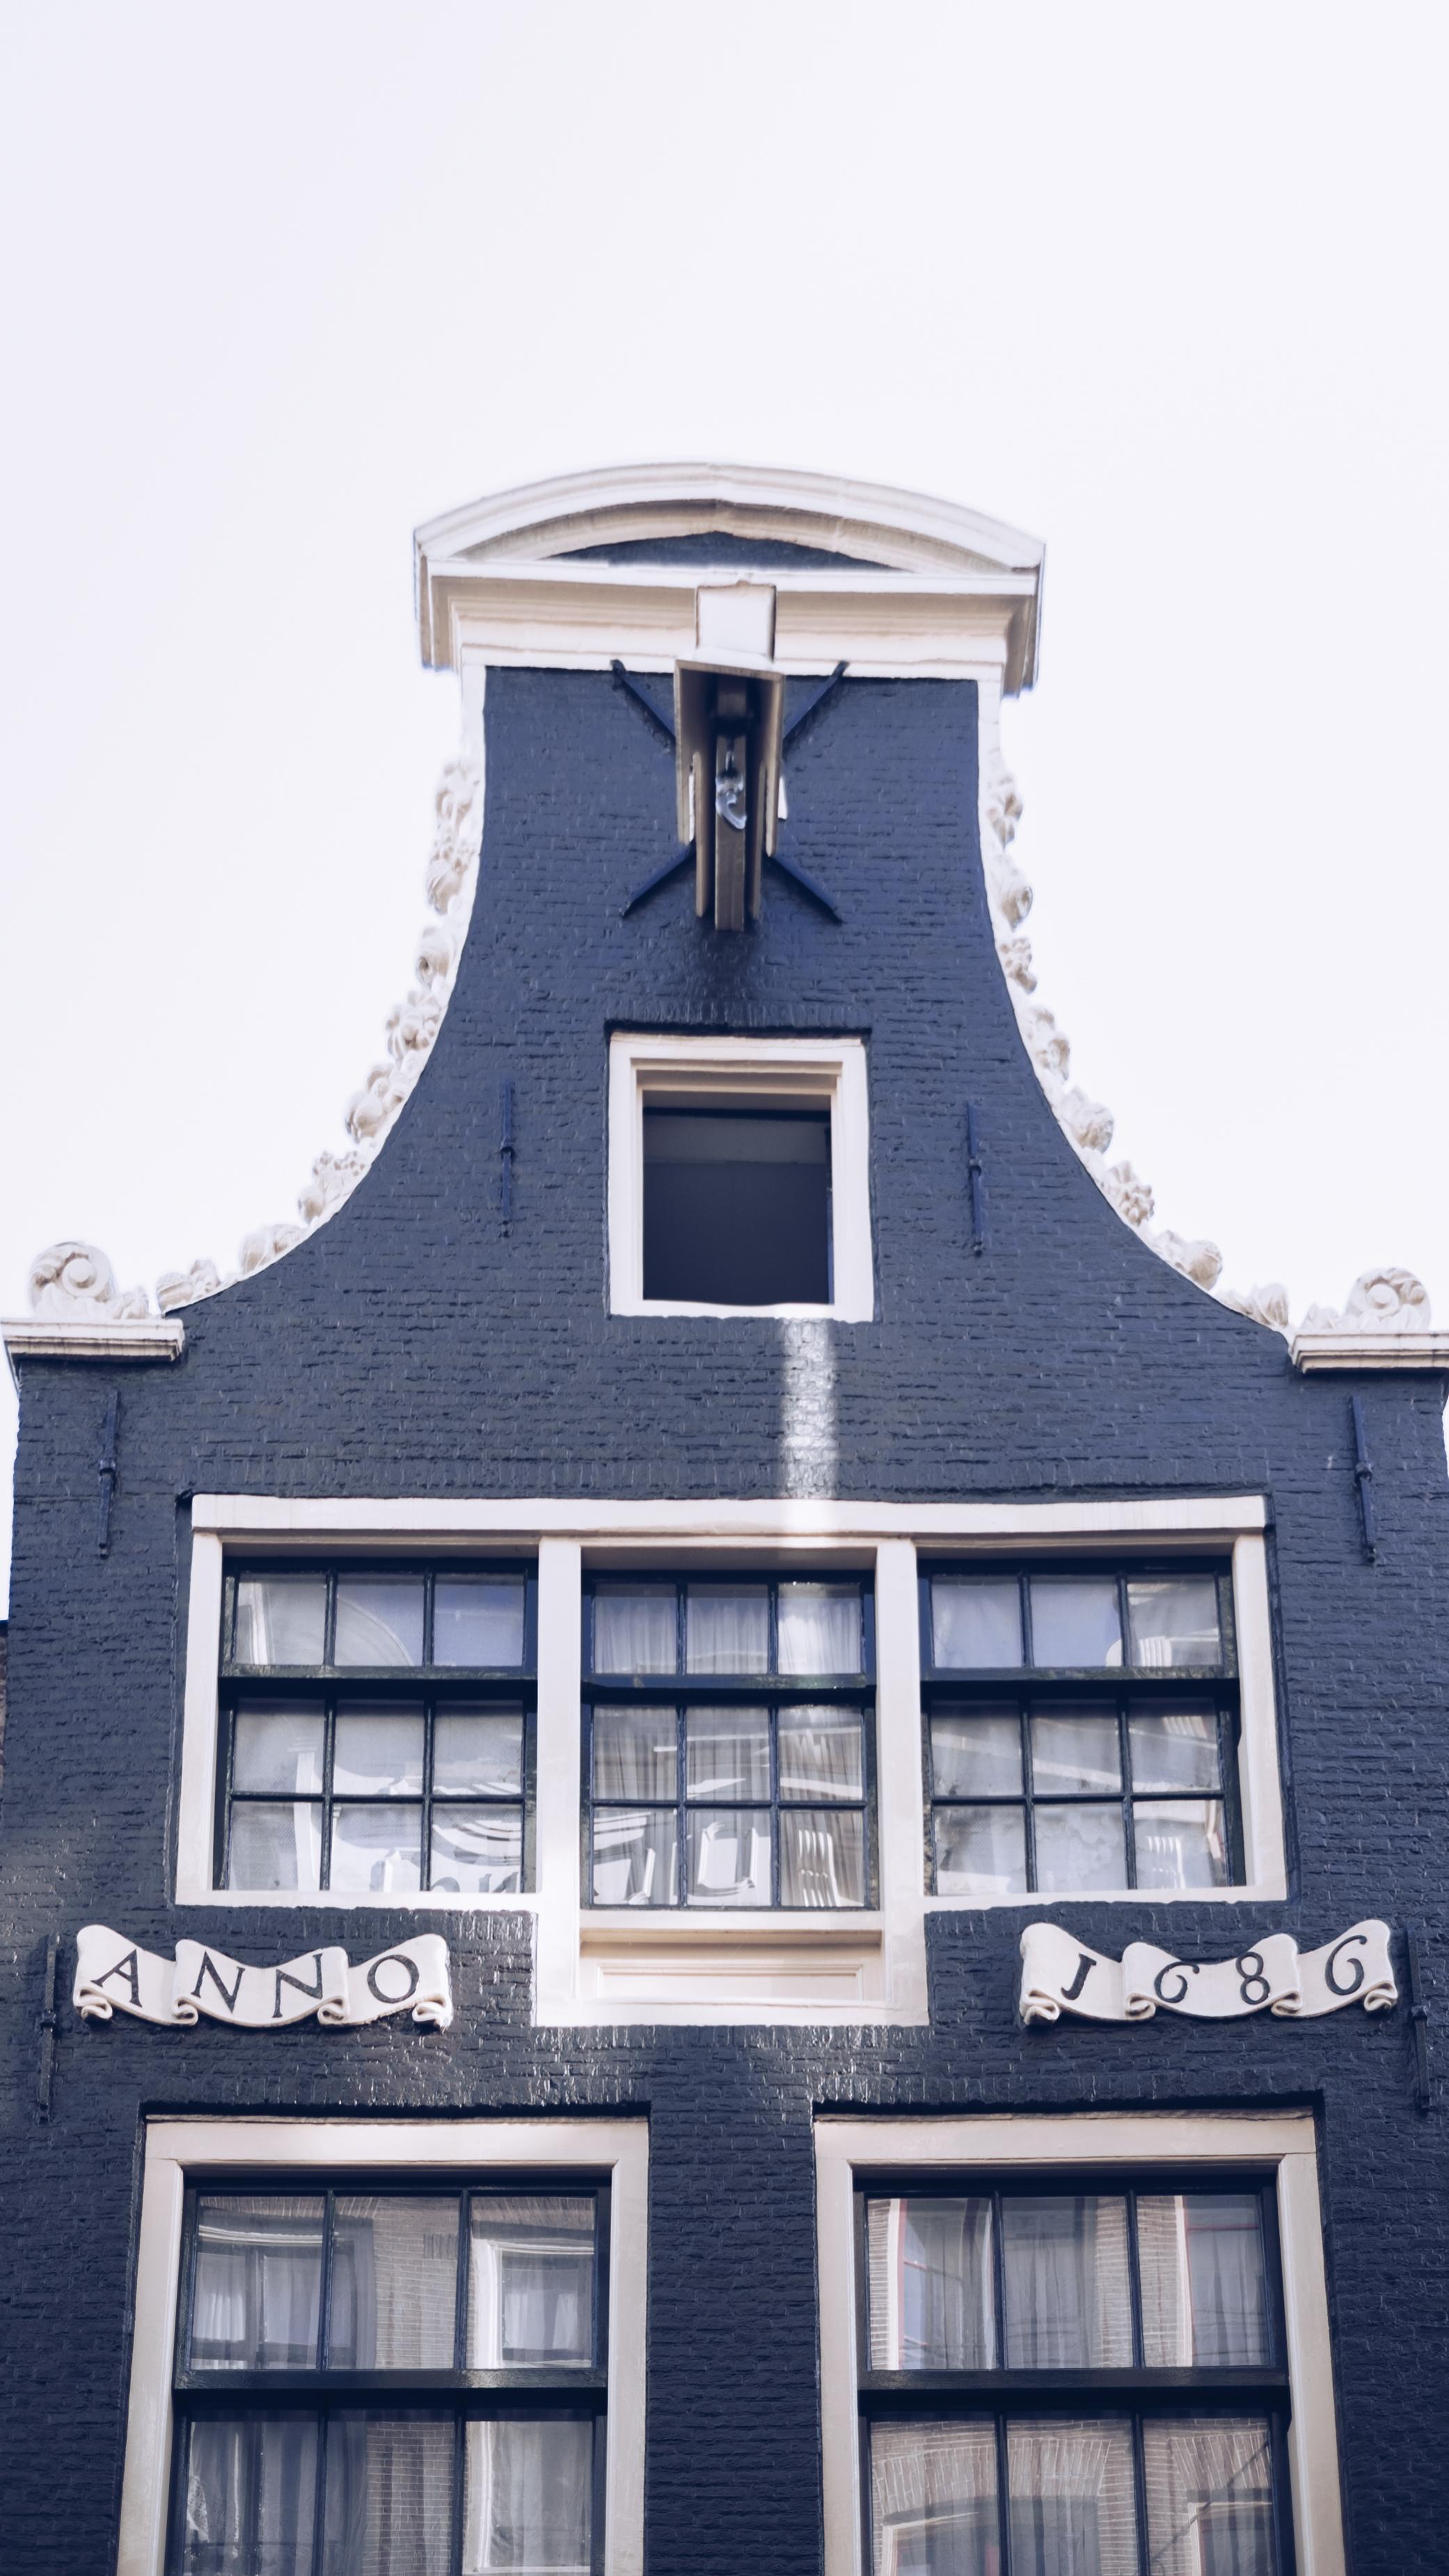 amsterdam-54.jpg